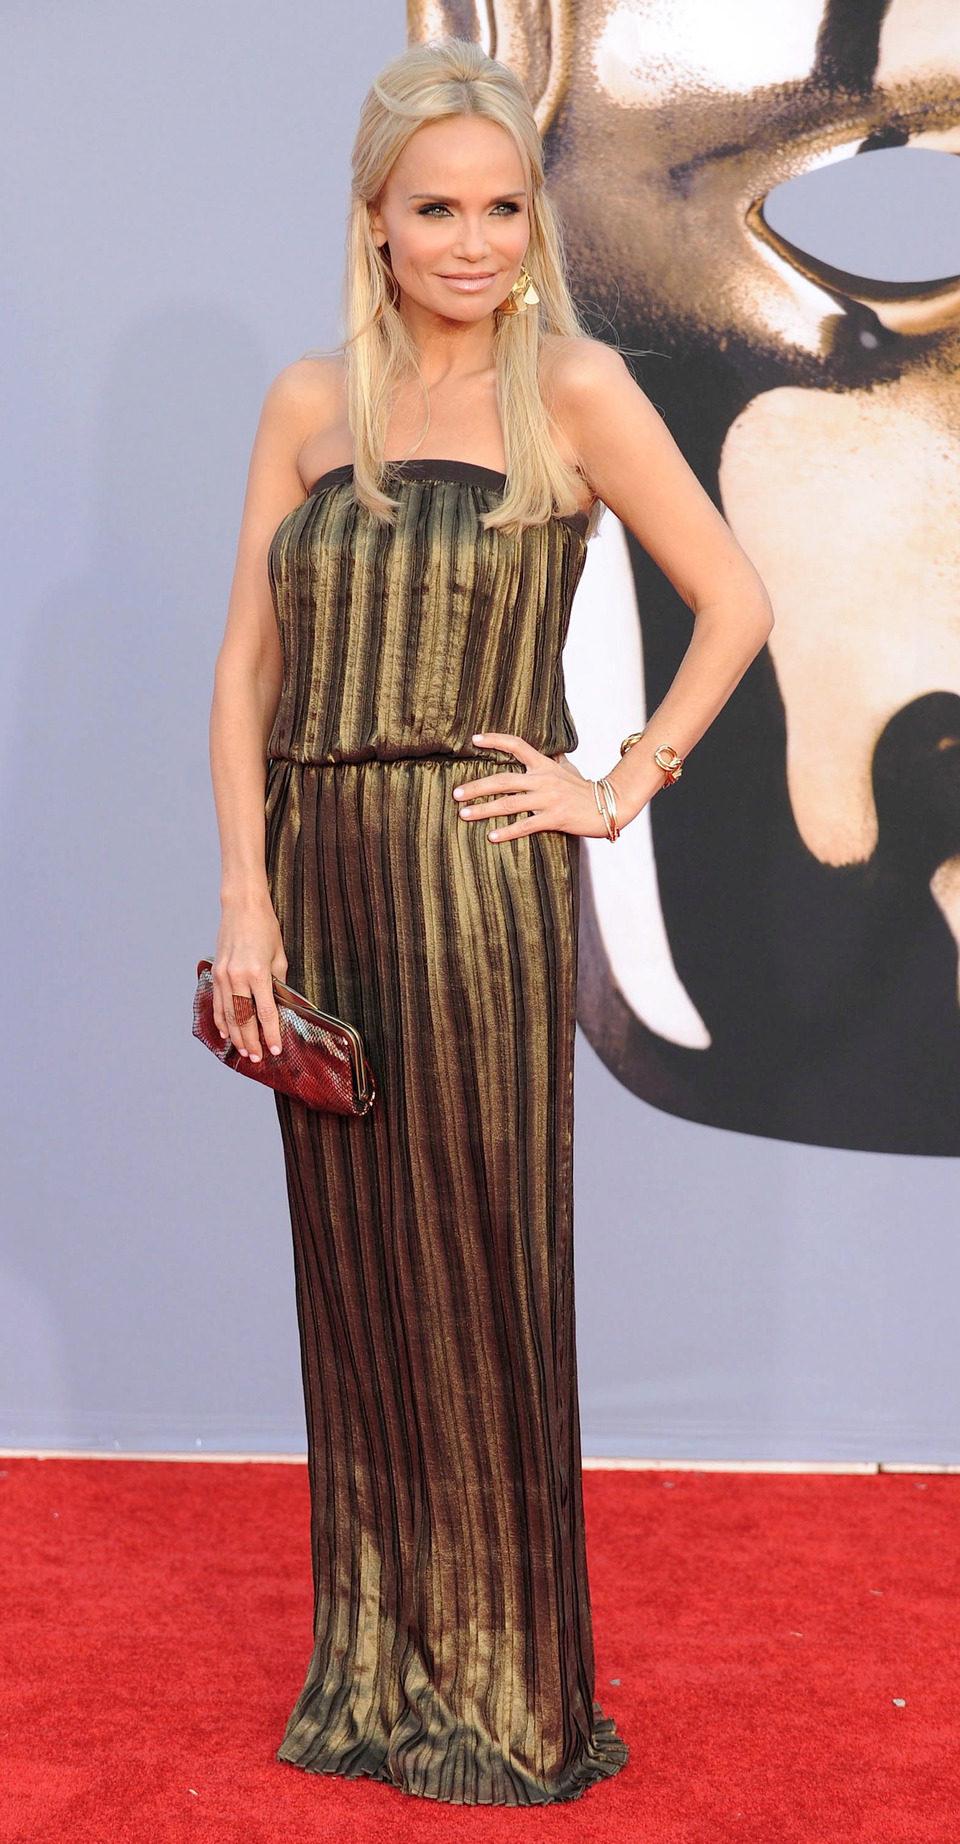 Kristin Chenoweth en el photocall del Belasco Theater